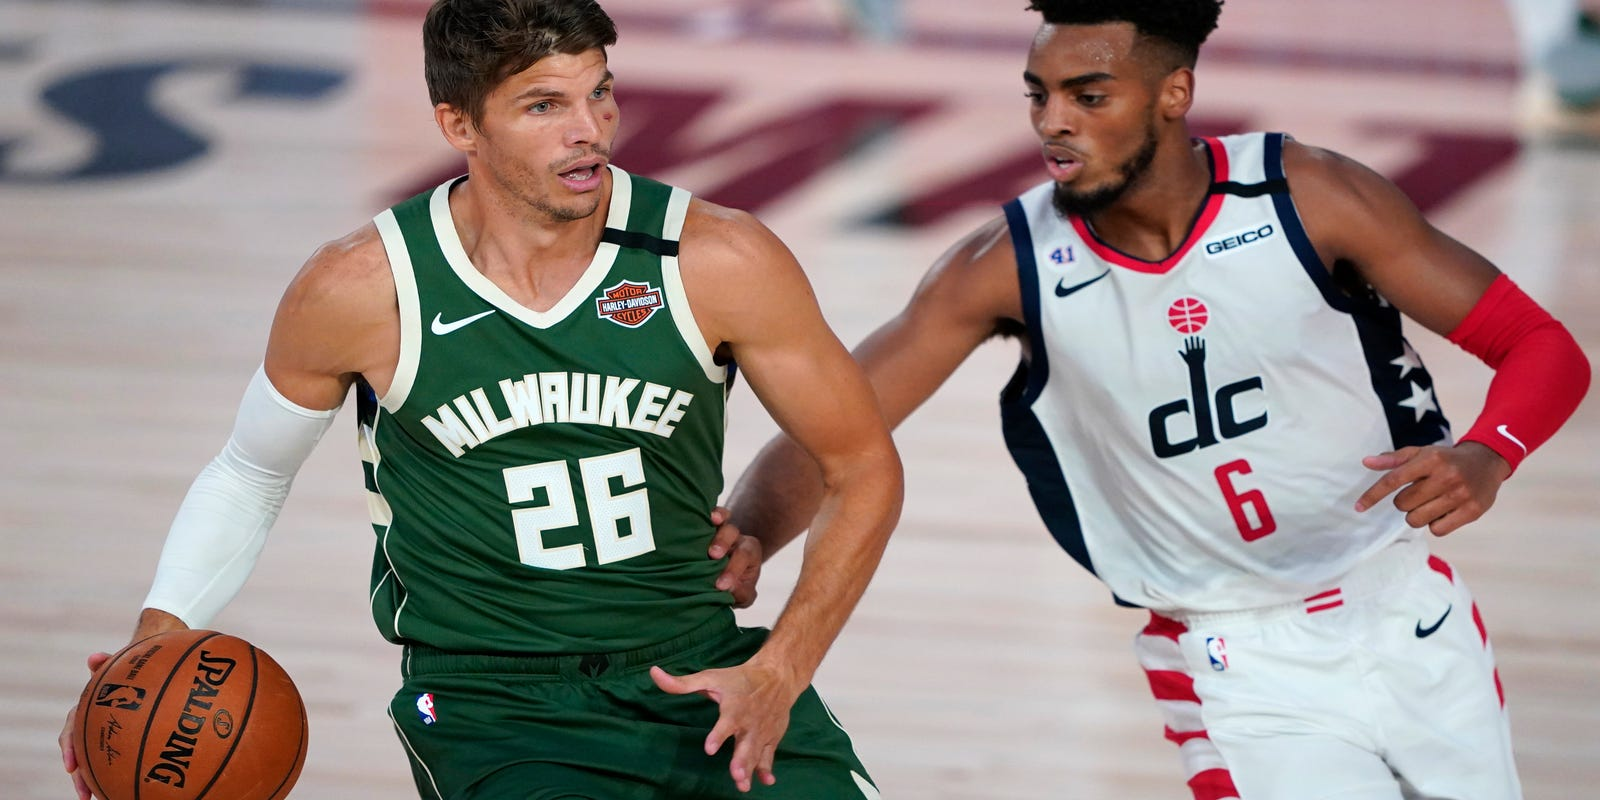 Kyle Korver details emotional backstory of Bucks' boycott during NBA playoffs